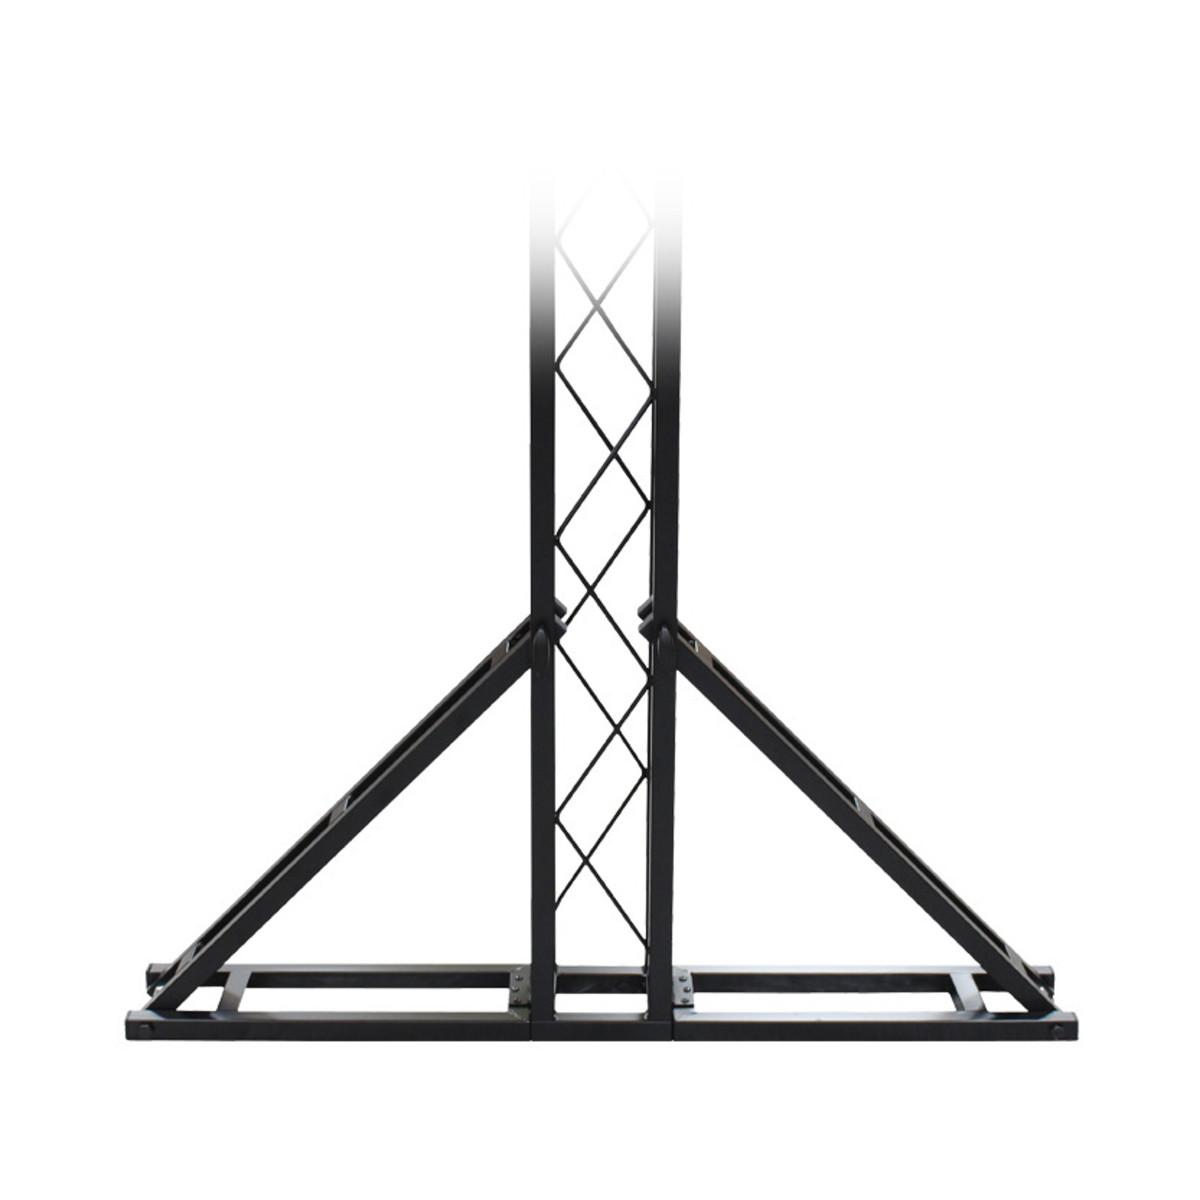 Equinox 3 X 2m Truss System Black At Gear4music